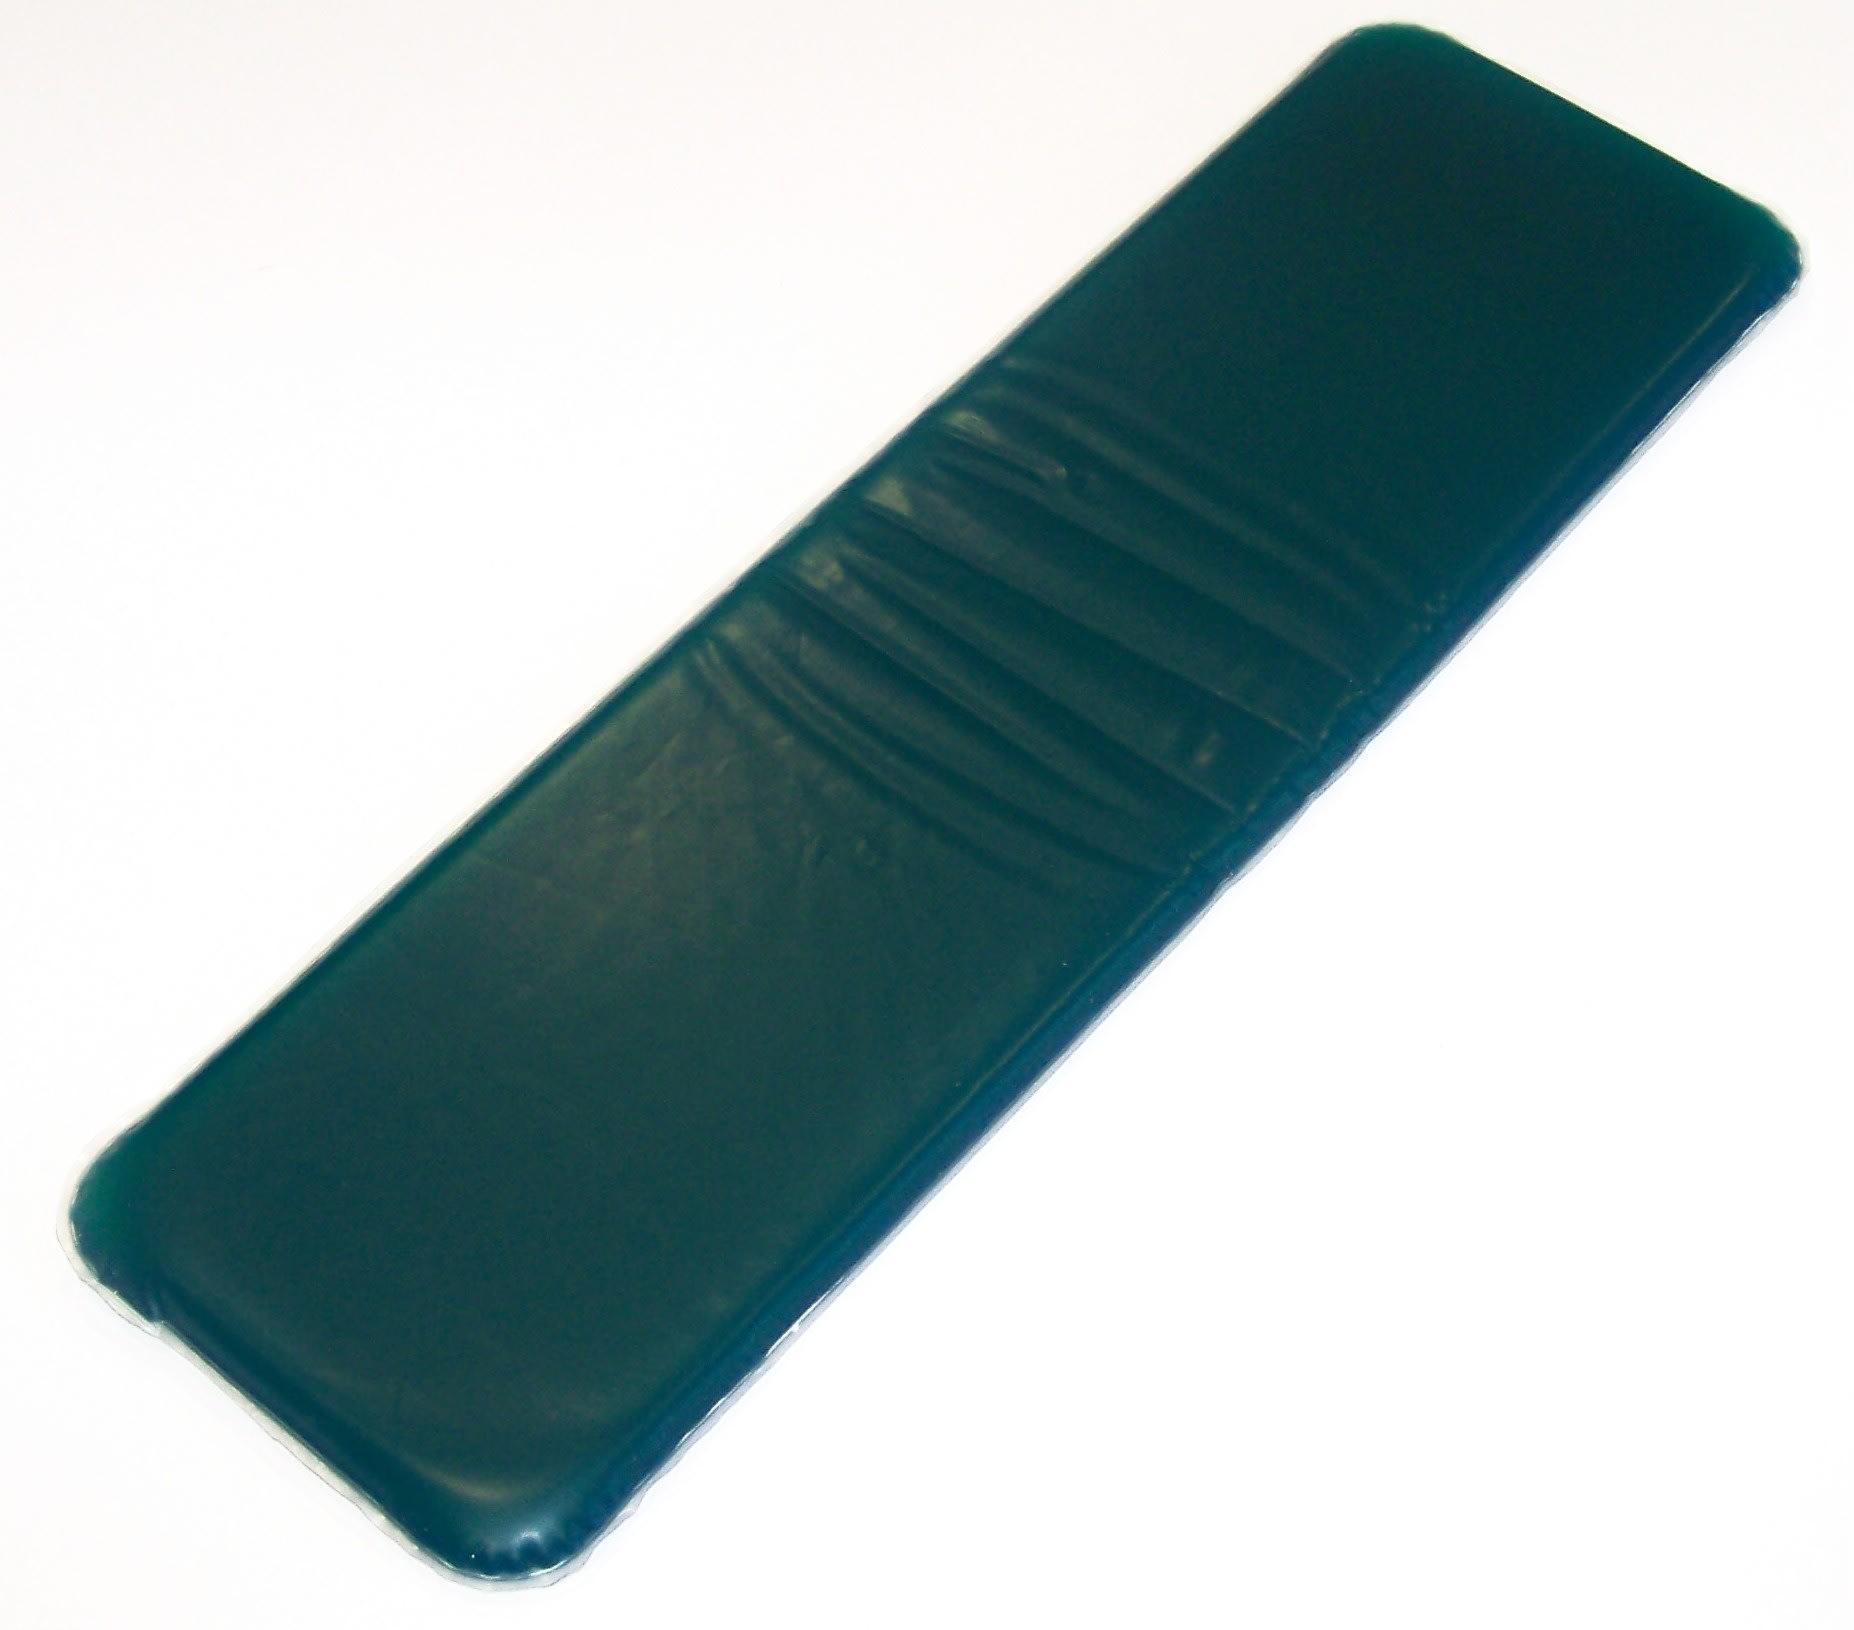 Oasis Armboard Pad (OA070) - Infant / Adolescent / Adult - 395 x 115 x 10mm